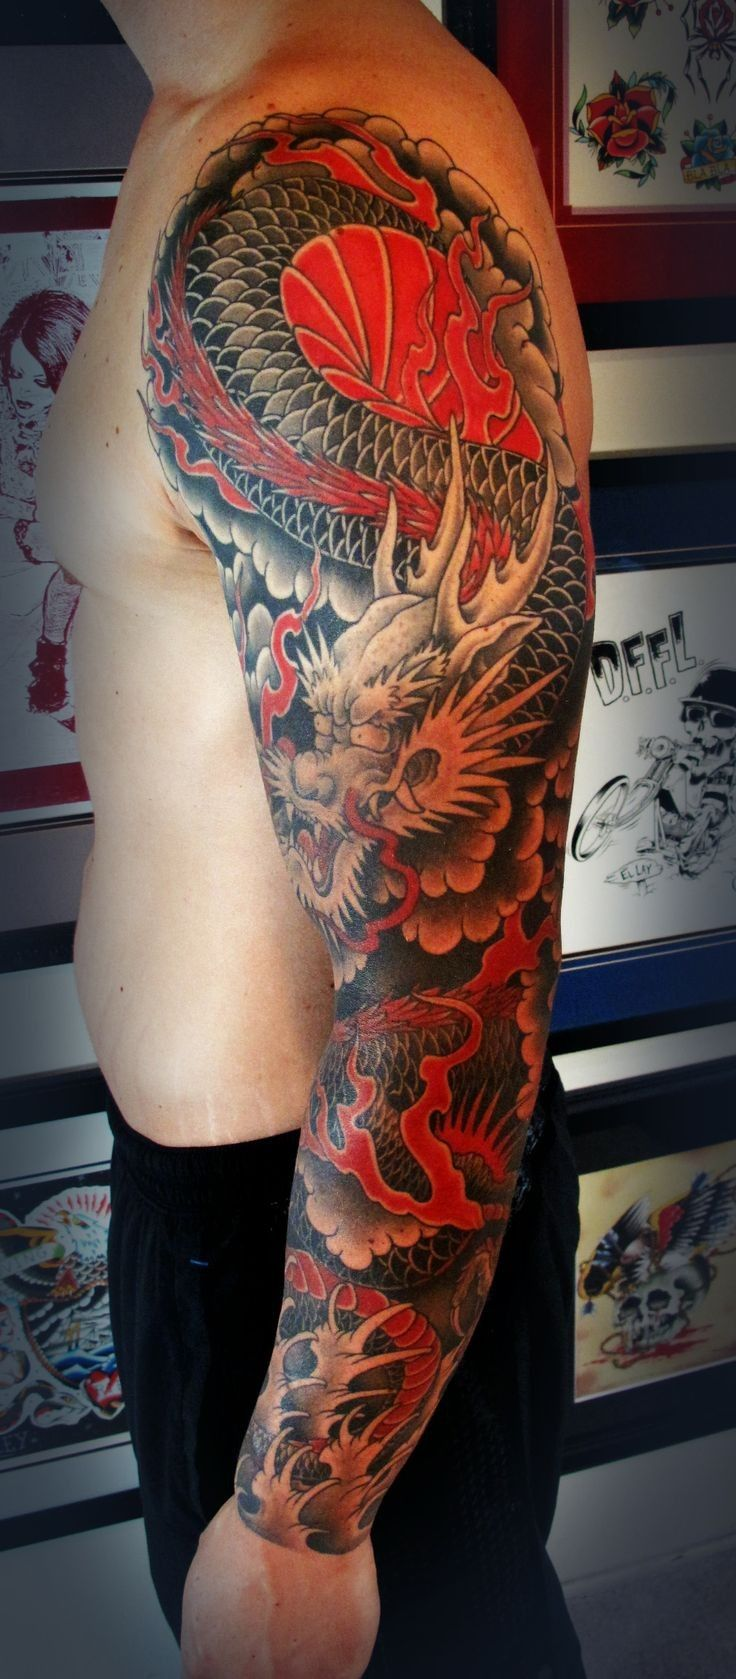 Japanese Red Dragon Tattoo On Whole Arm Dragon Sleeve Tattoos Japanese Sleeve Tattoos Red Dragon Tattoo